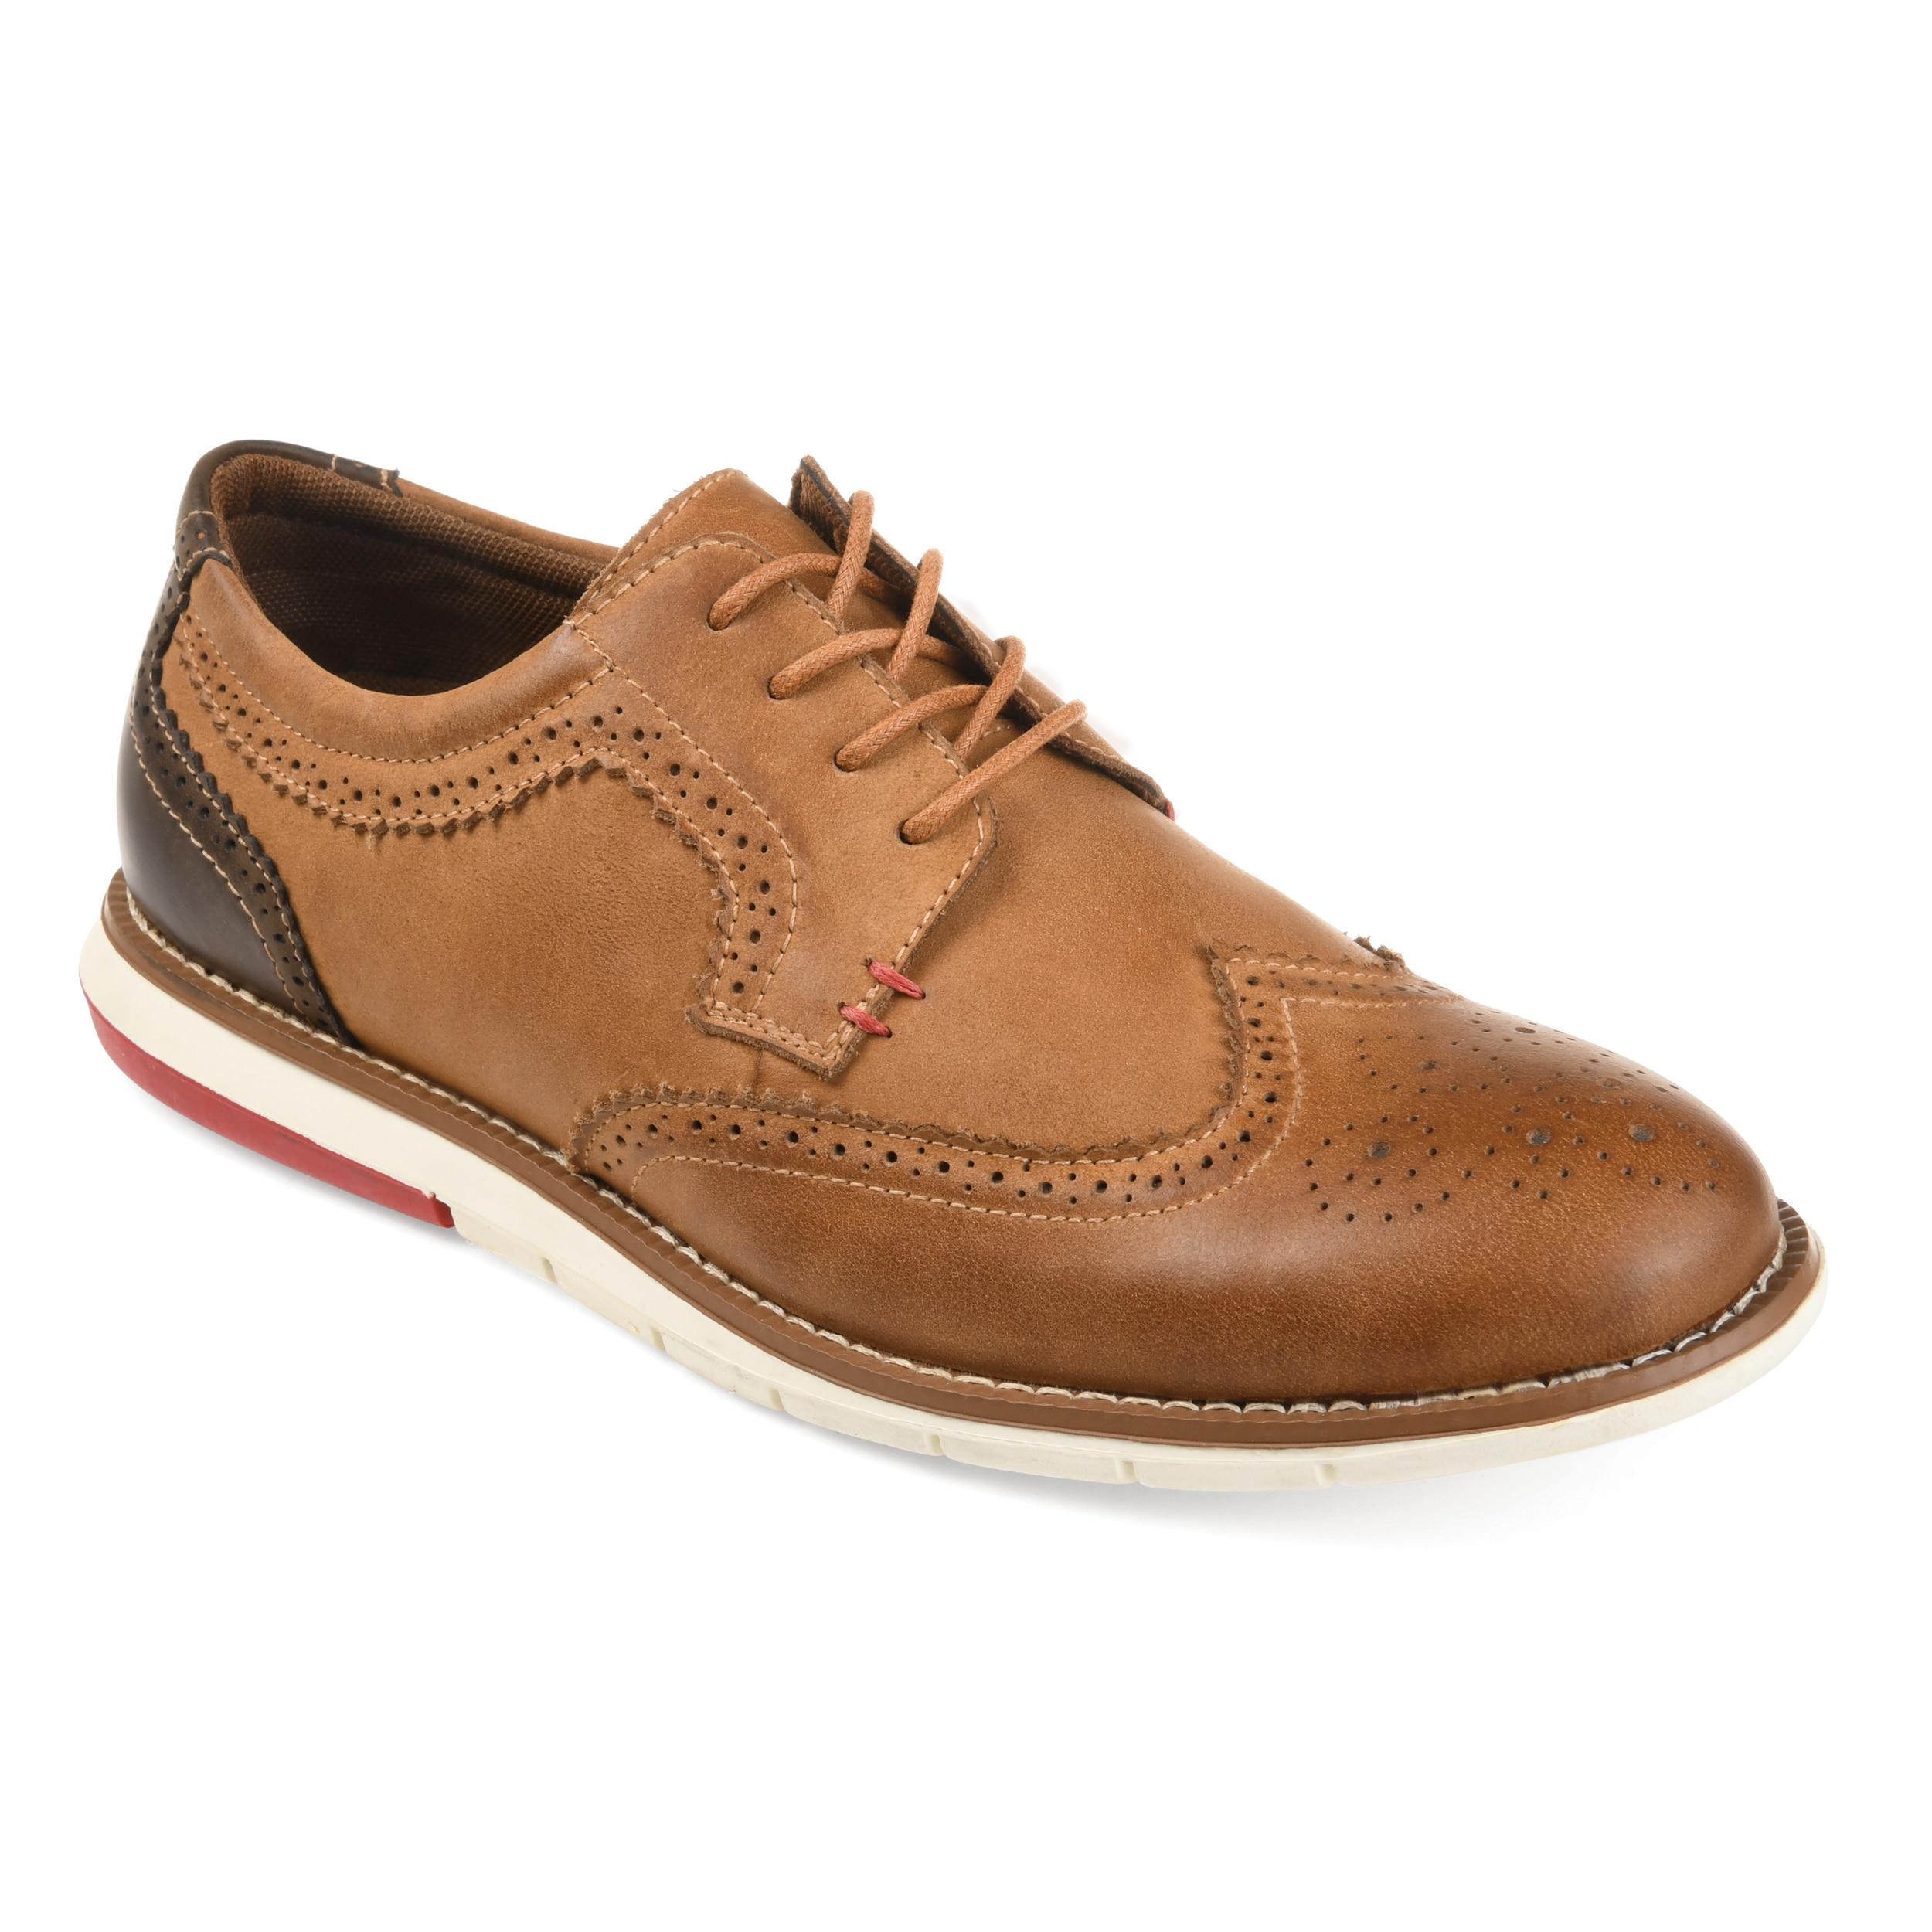 3ab5474da370 Shop Vance Co. Men s  Drake  Comfort-sole Genuine Leather Wingtip ...